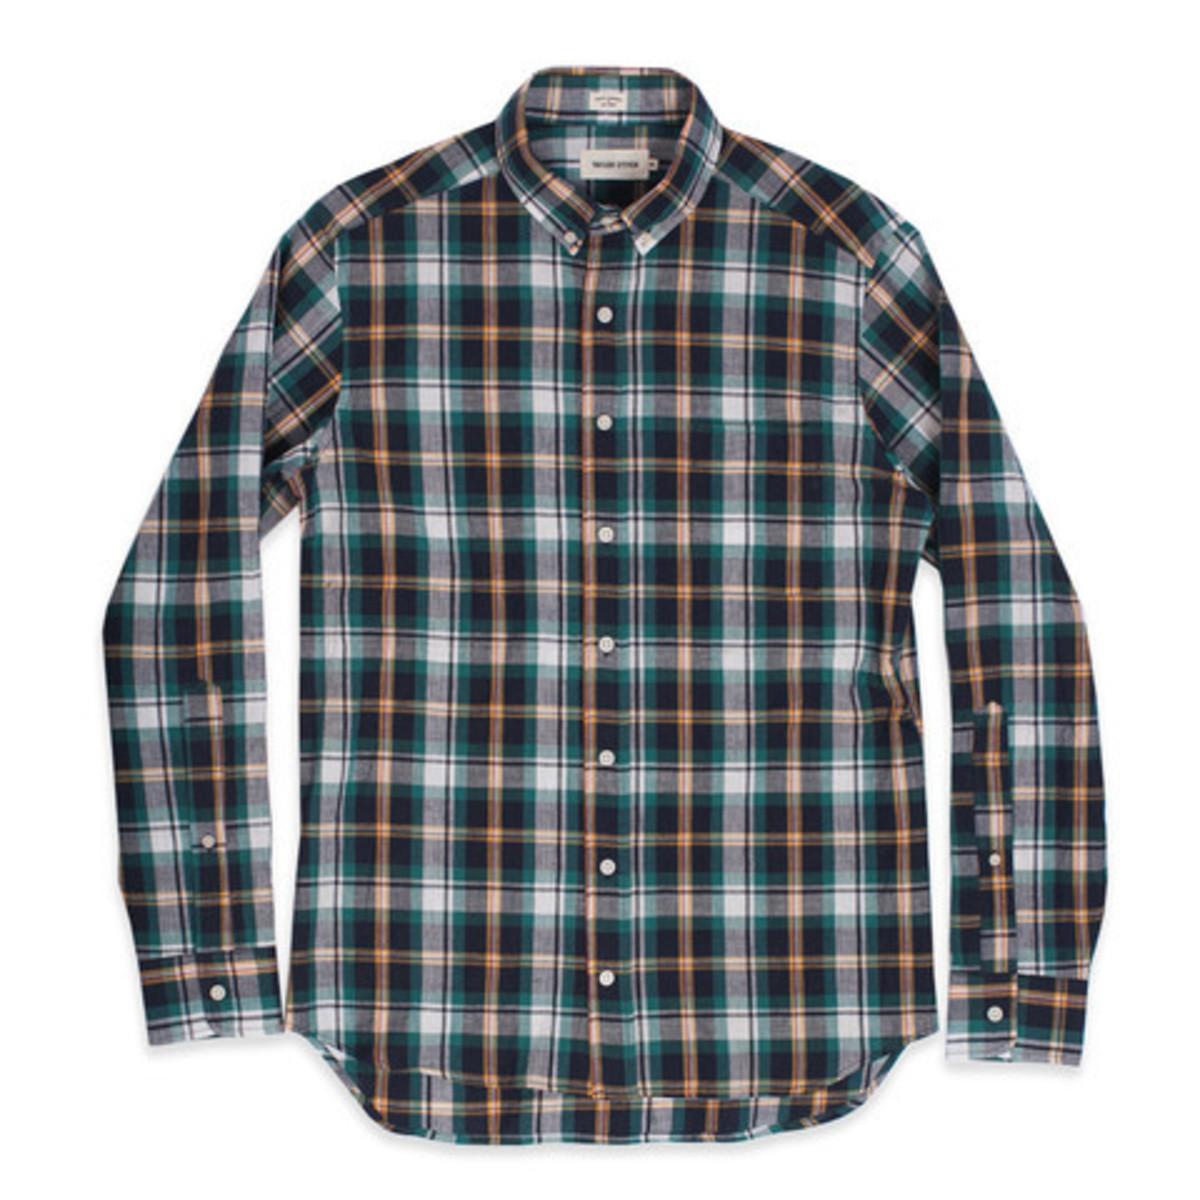 Men 39 s taylor stitch spruce indian madras shirt garmentory for Mens madras shirt sale